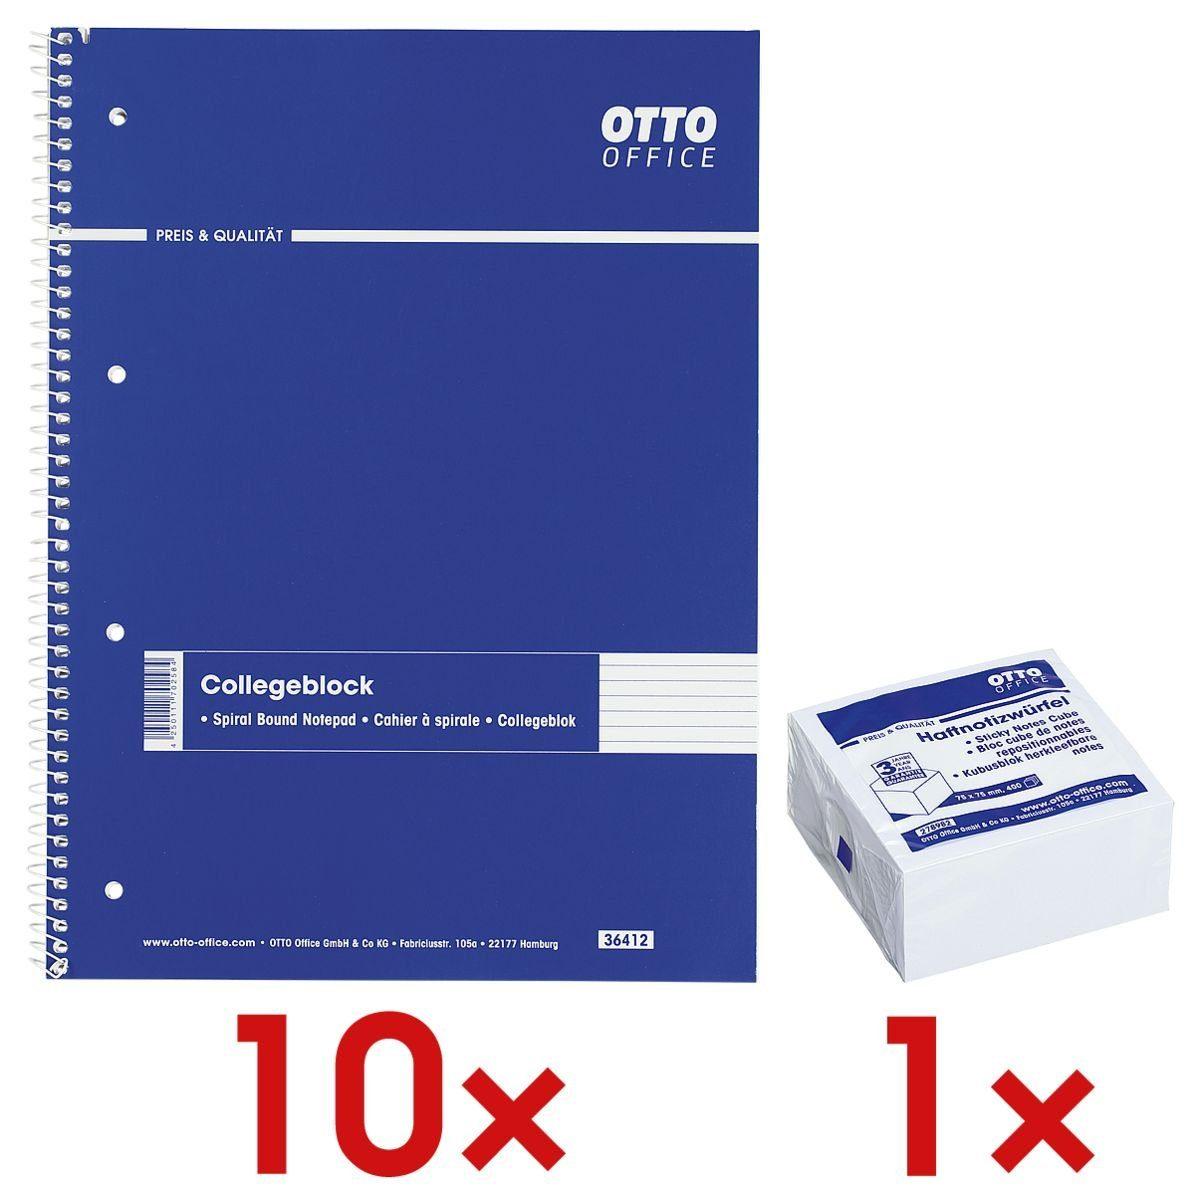 OTTO Office Standard 10 Collegeblöcke A4 liniert inkl. 1 Haftnotizwürfel 1 Set